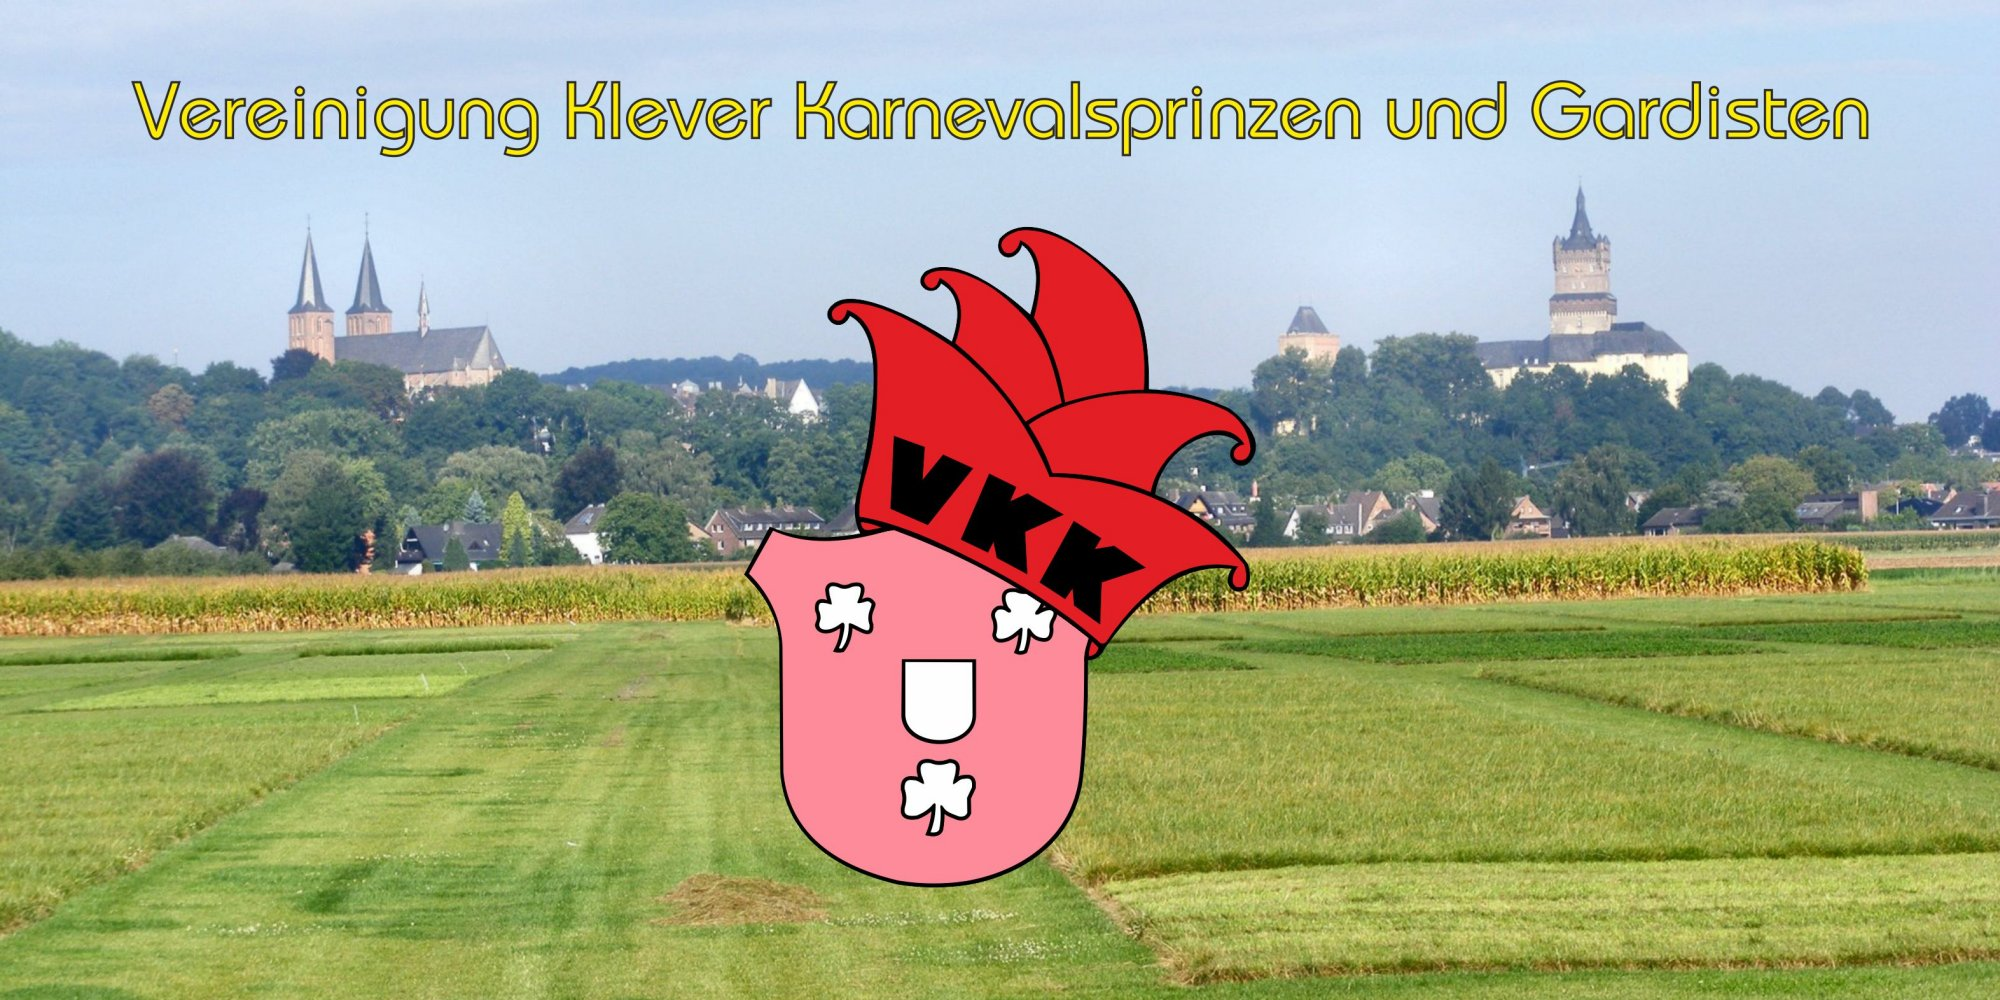 vkk-home